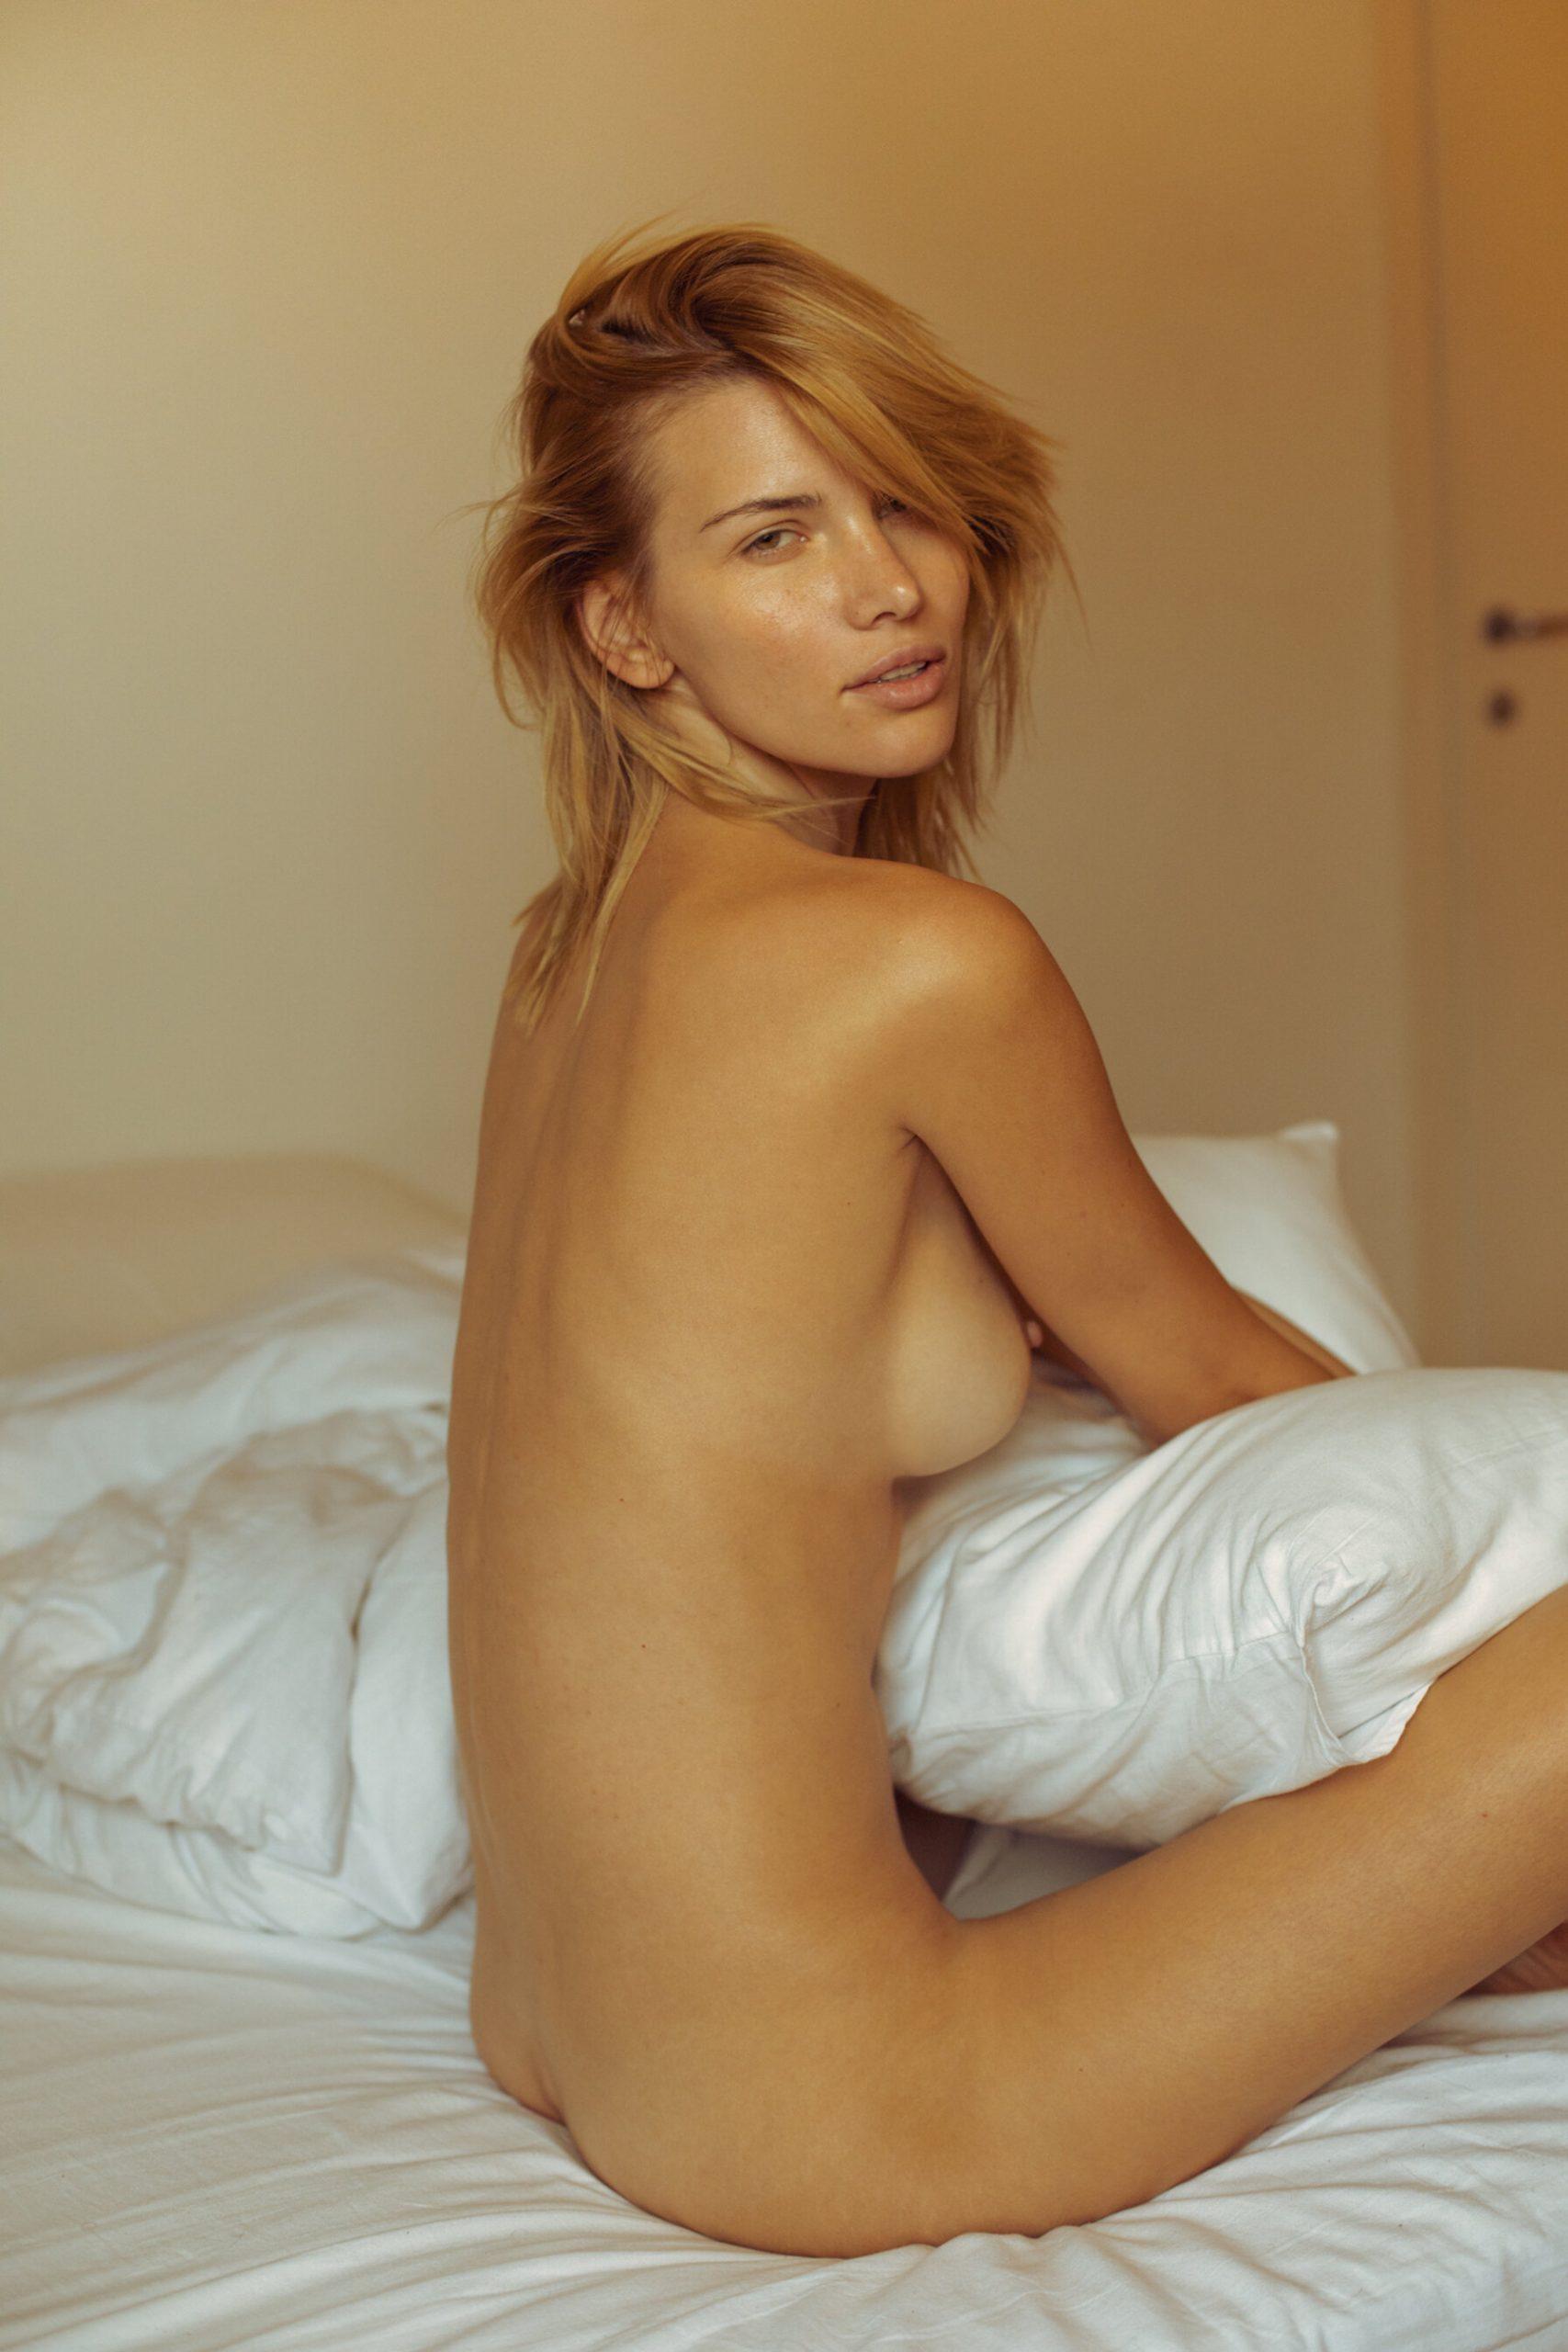 Gabriela Iliescu - Omar Coria photoshoot